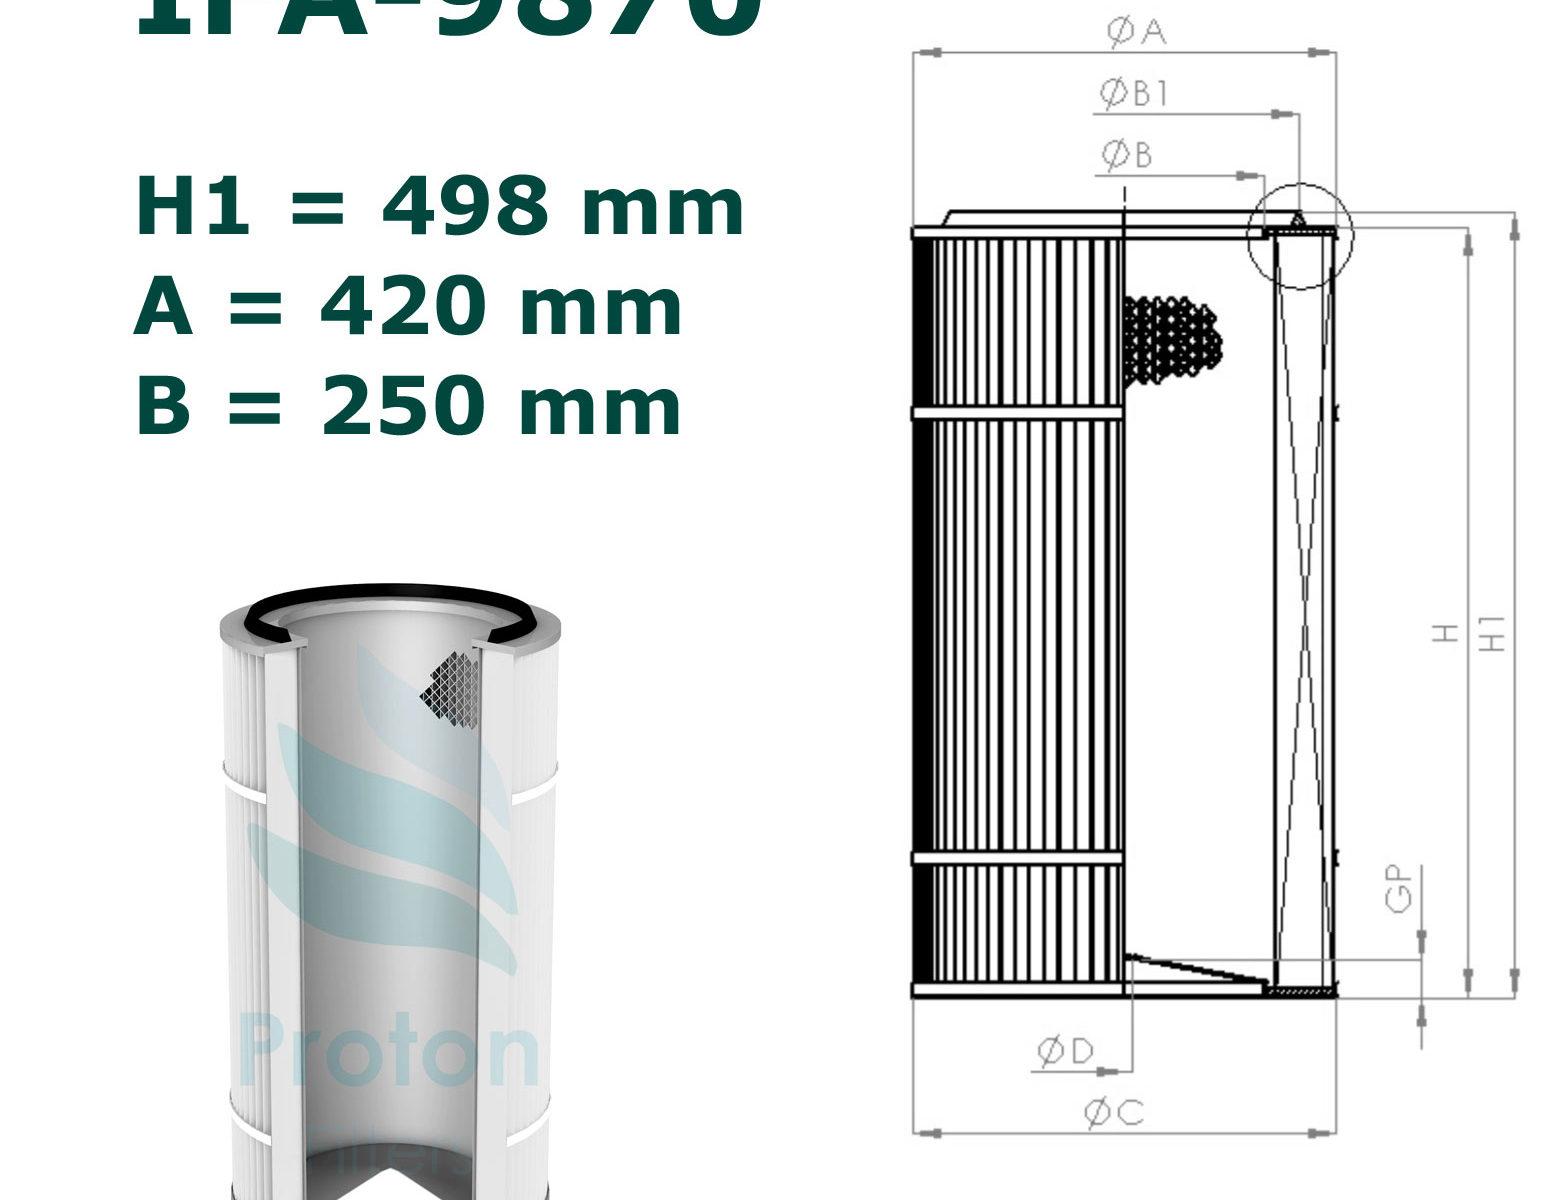 IFA-9870-1565x1200